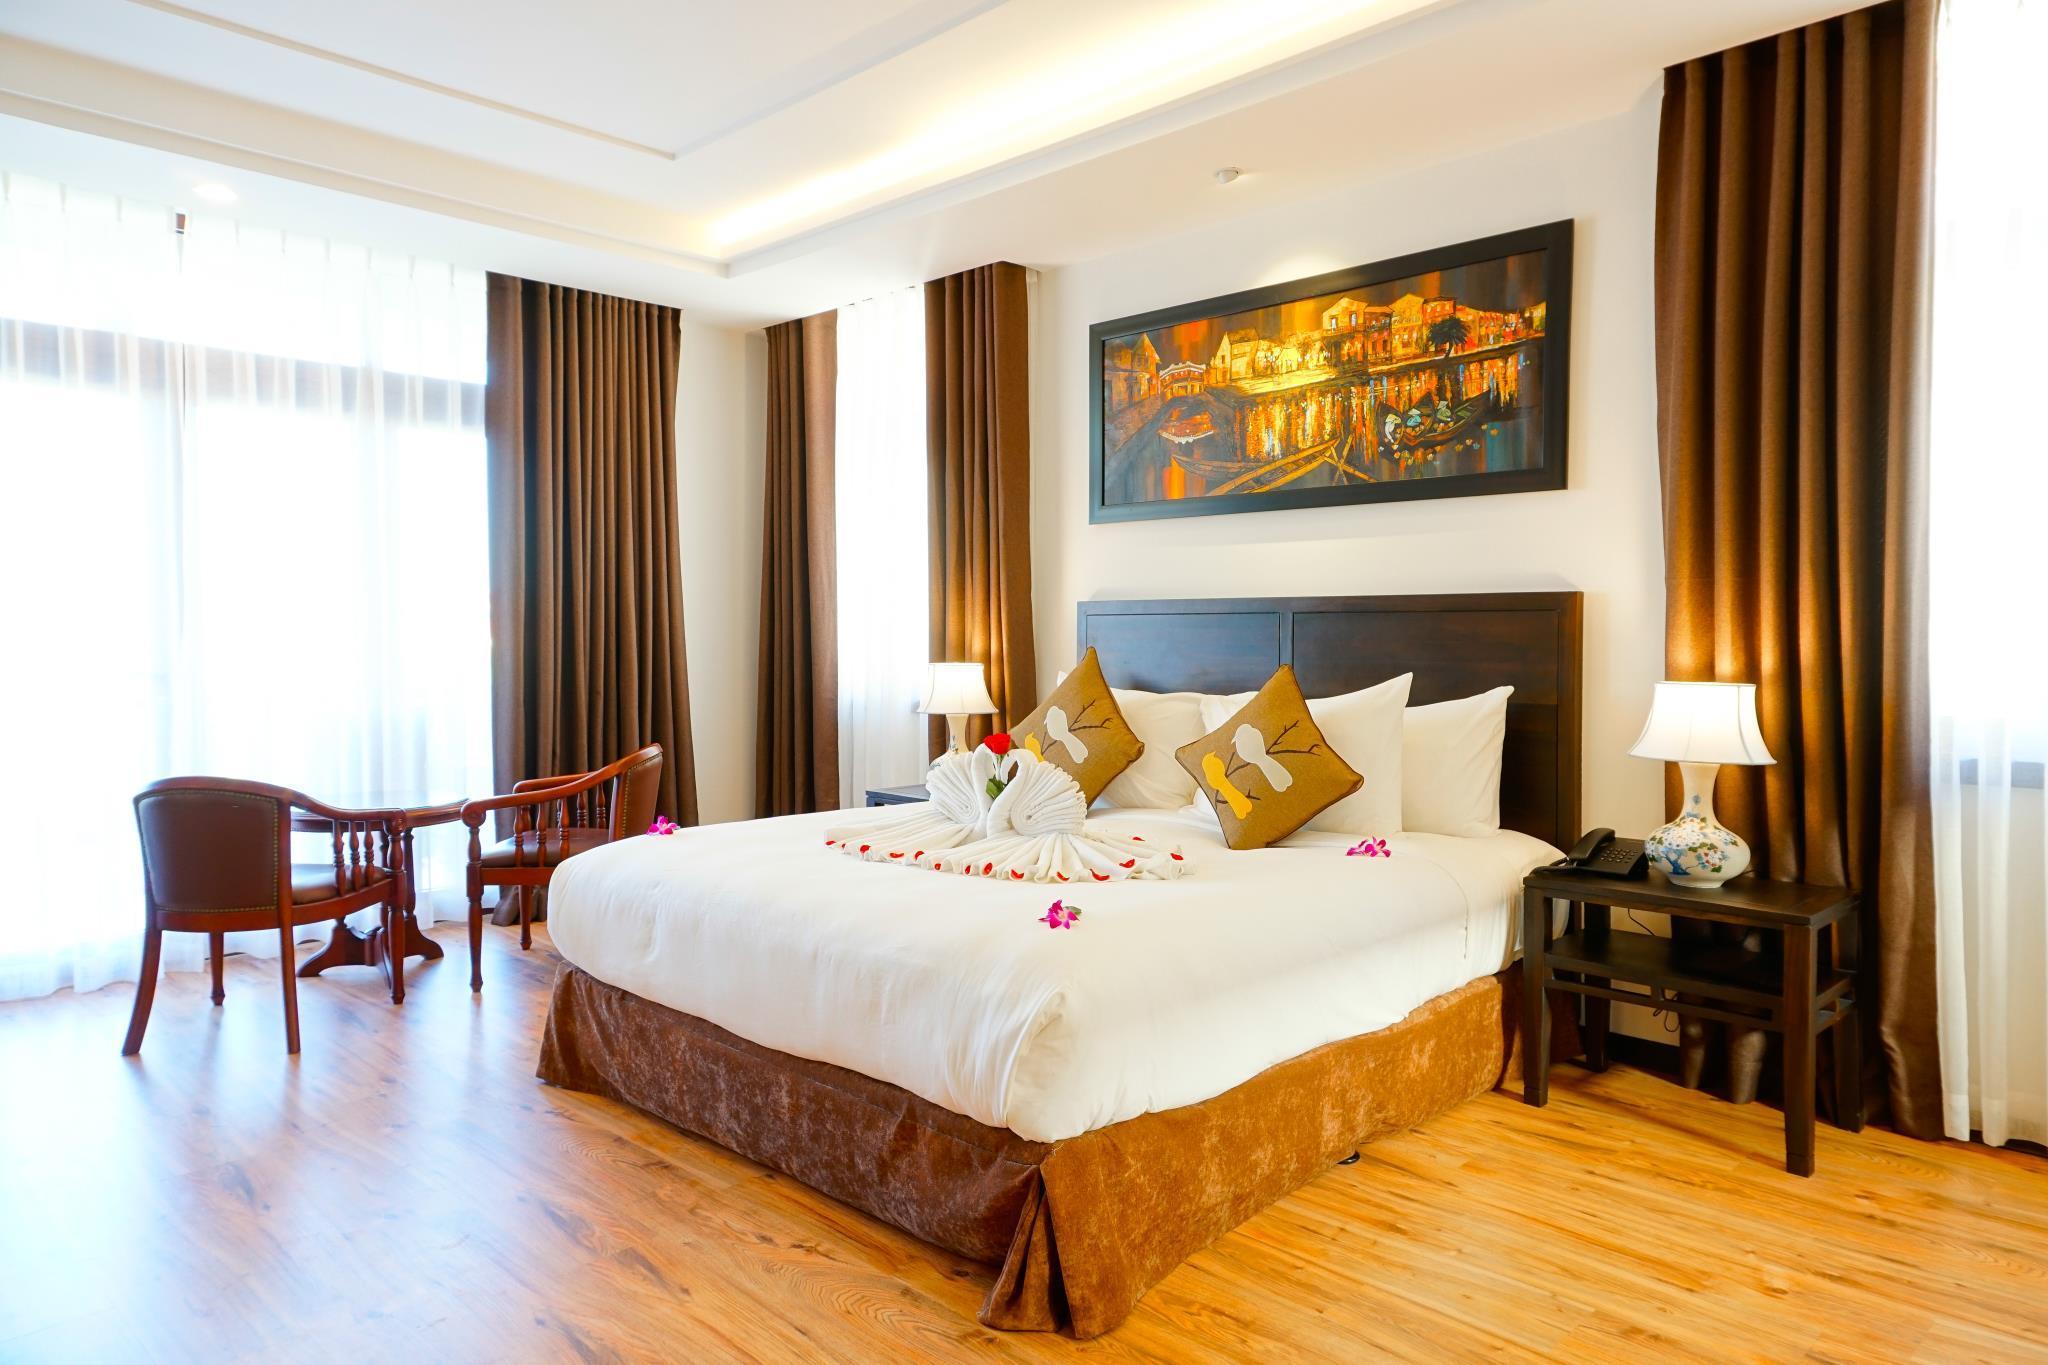 Luxury Pool Villa Alongside The Scenic Hoai River